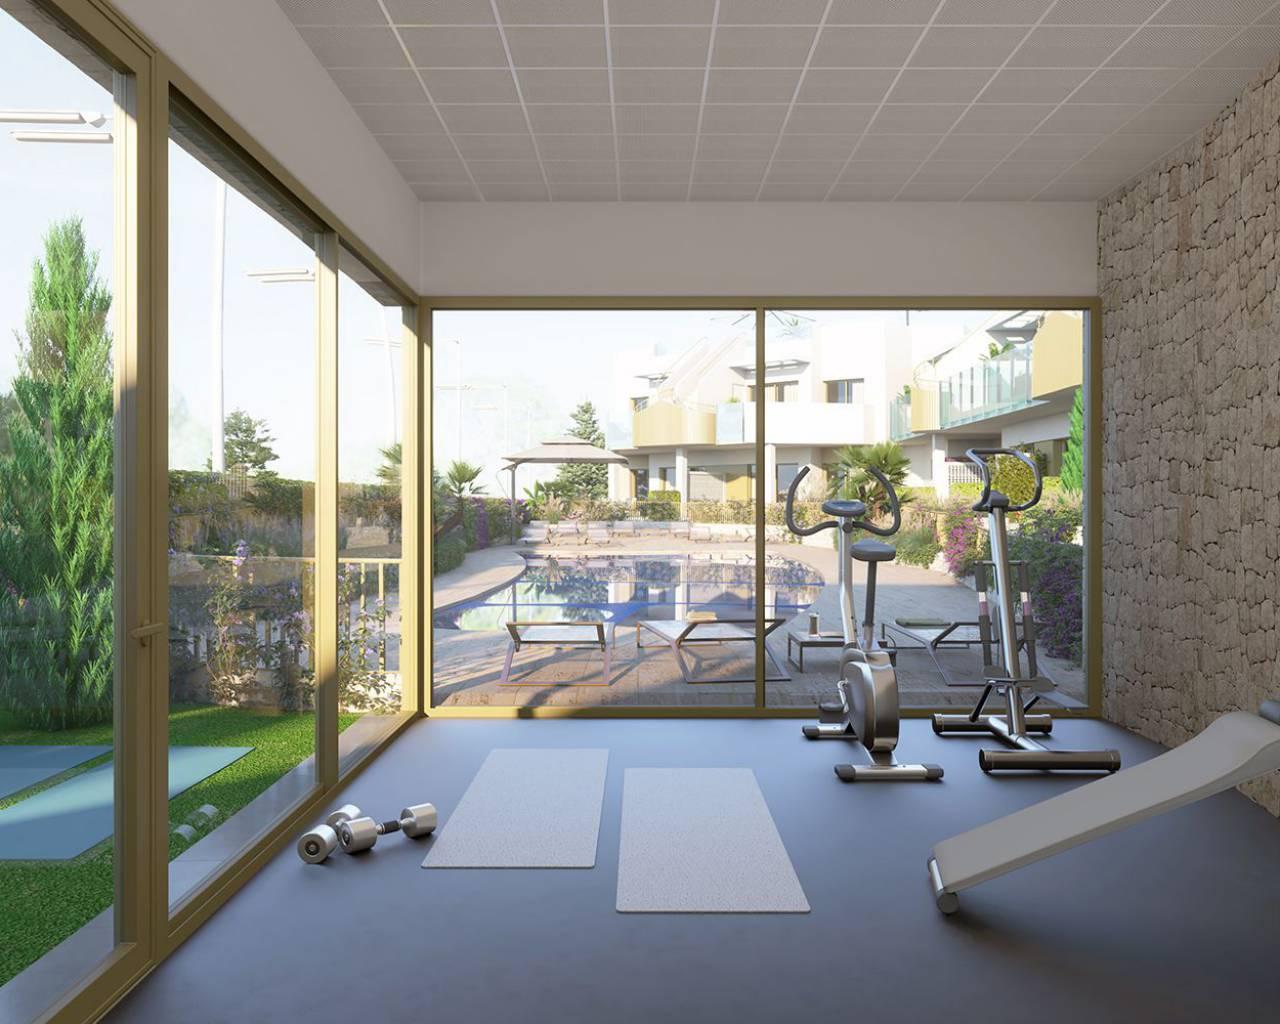 nieuwbouw-appartement-pilar-de-la-horadada_5788_xl